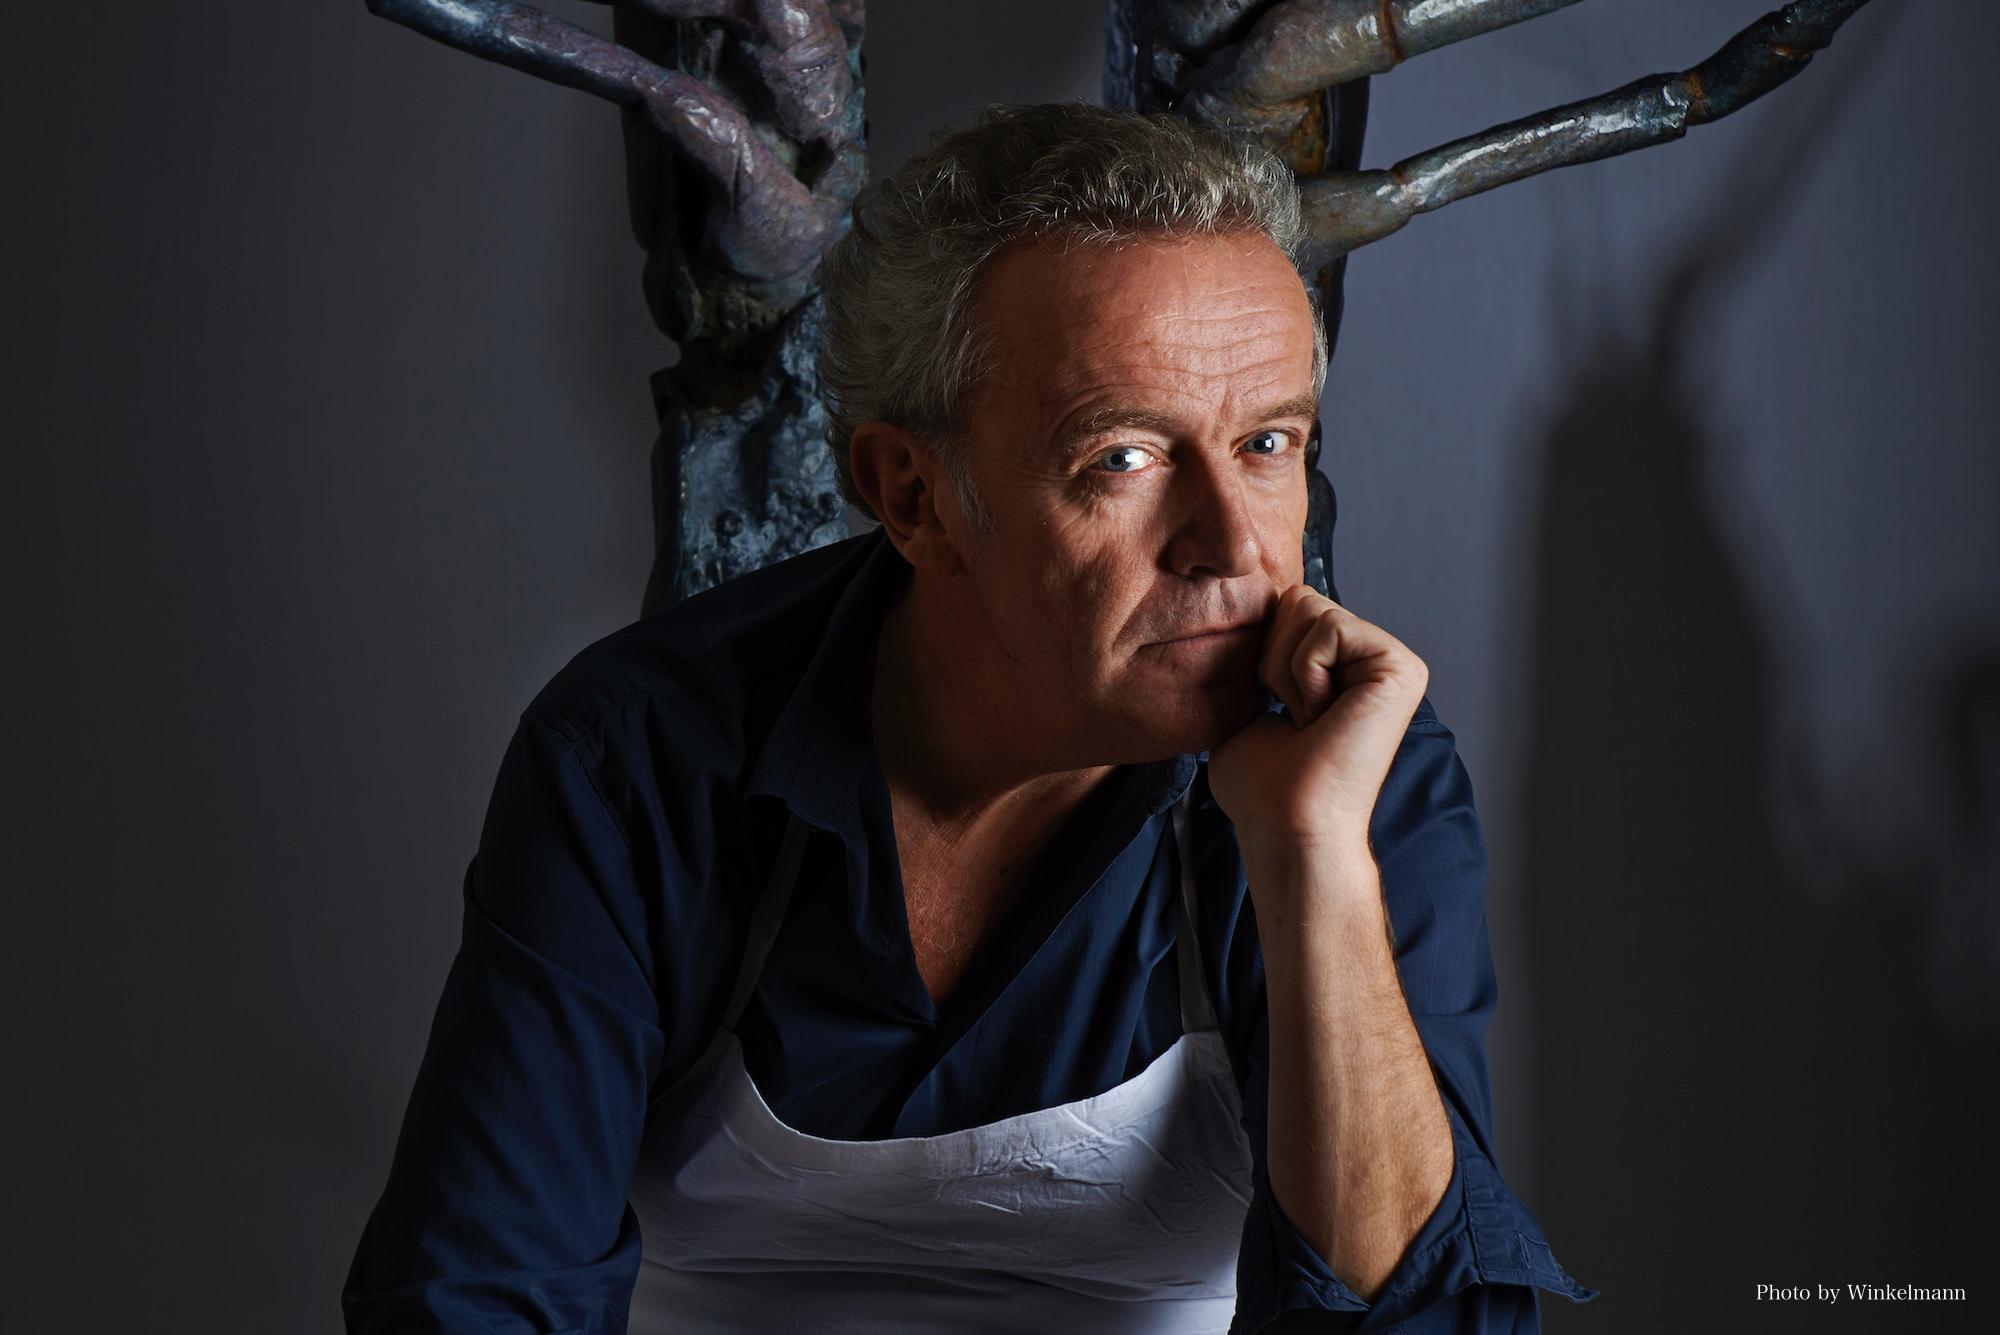 Arpège Alain Passard